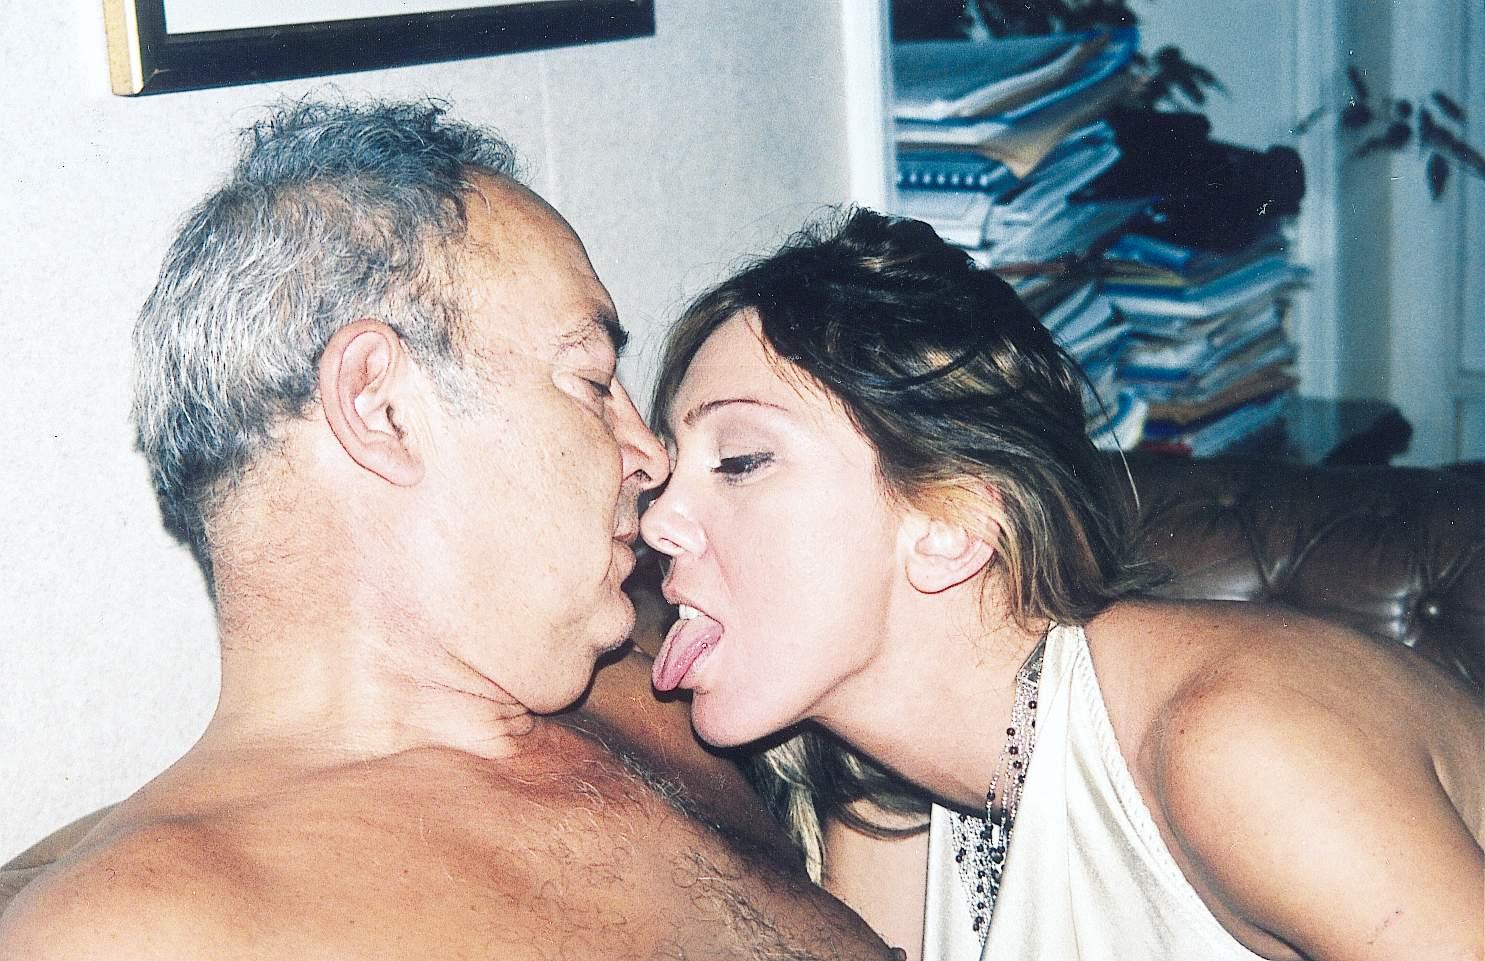 Sibel kekilli doktorda muayne oldu  Sürpriz Porno Hd Türk